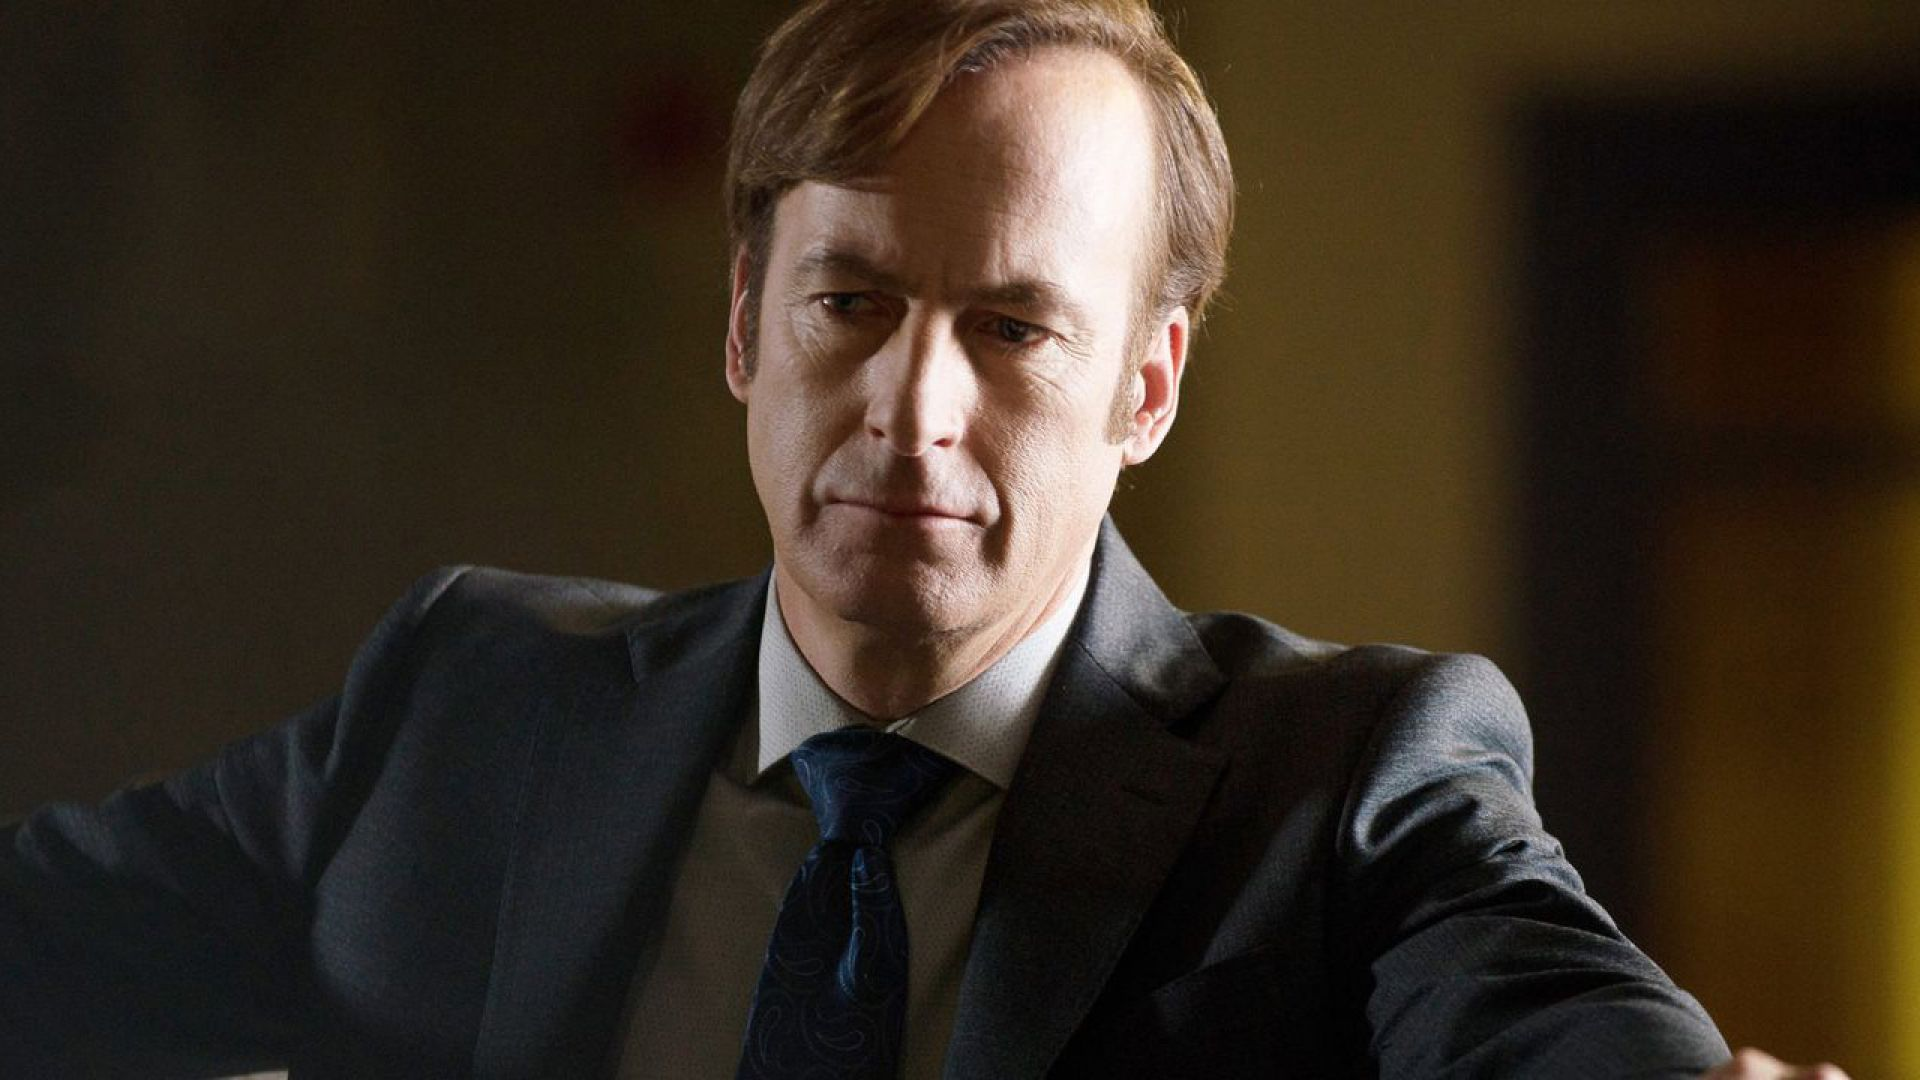 حضور باب اودنکرک در سریال Better Call Saul